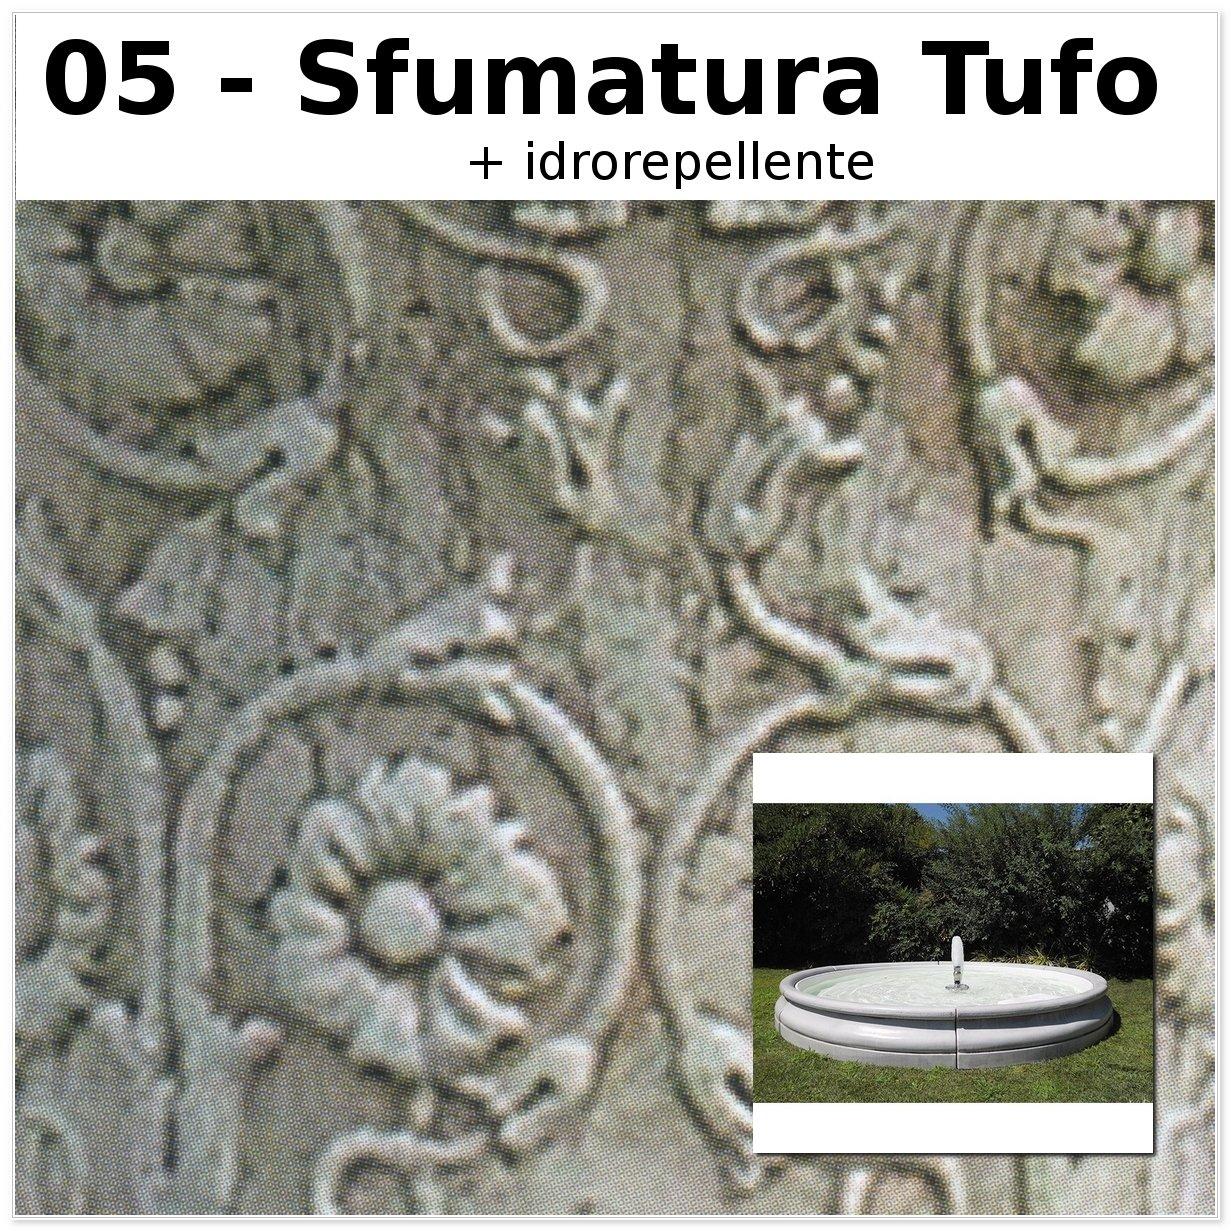 FONTANA DA GIARDINO SONDRIO CM240X240X32H SFUMATURA TUFO